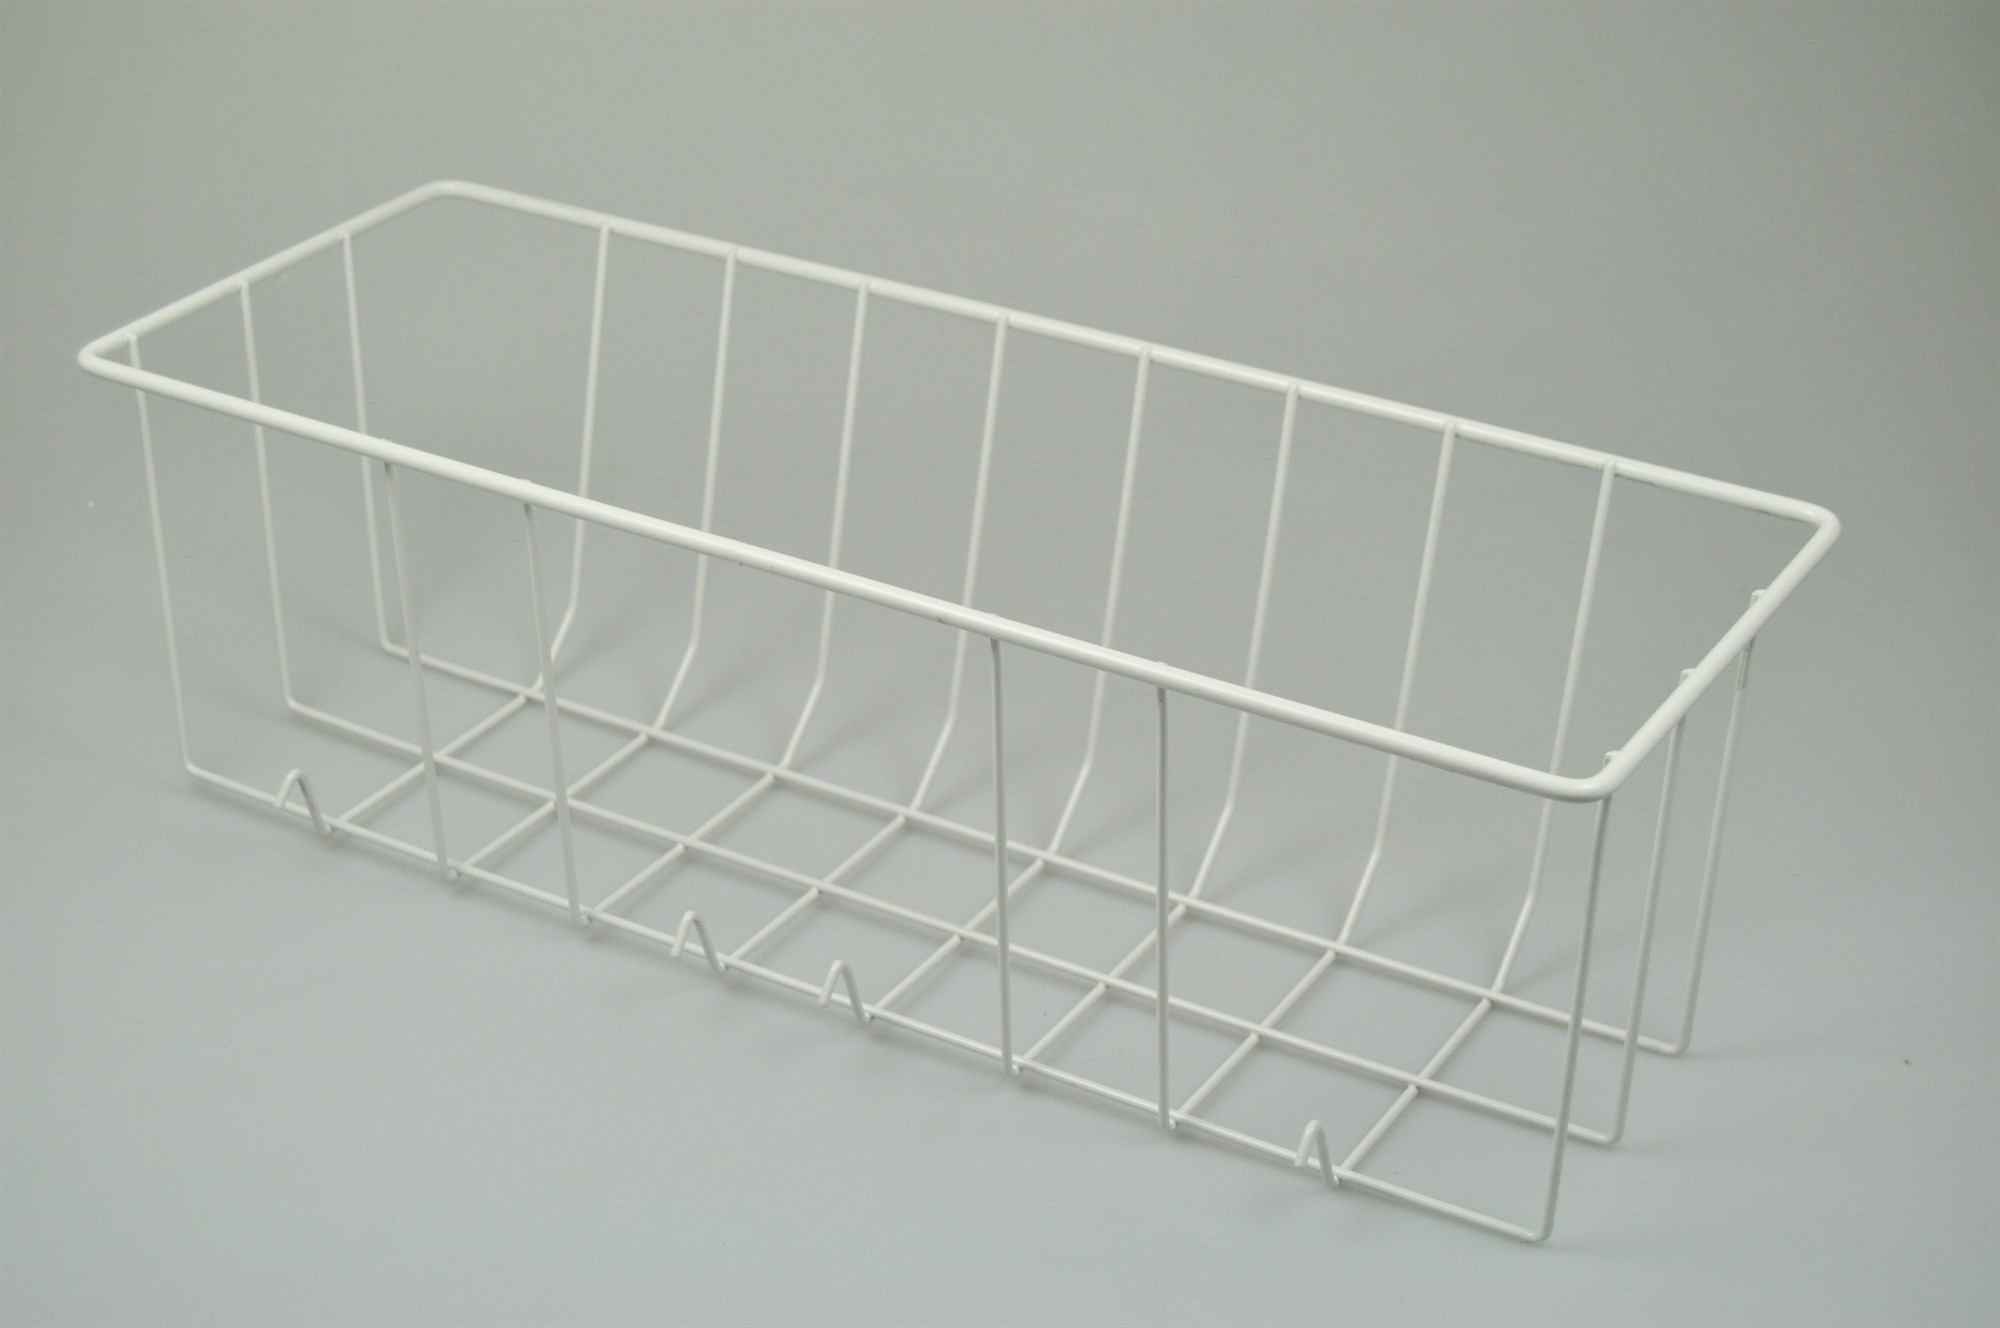 bac l gume vestfrost frigo cong lateur 150mm x 473mm x 175mm. Black Bedroom Furniture Sets. Home Design Ideas